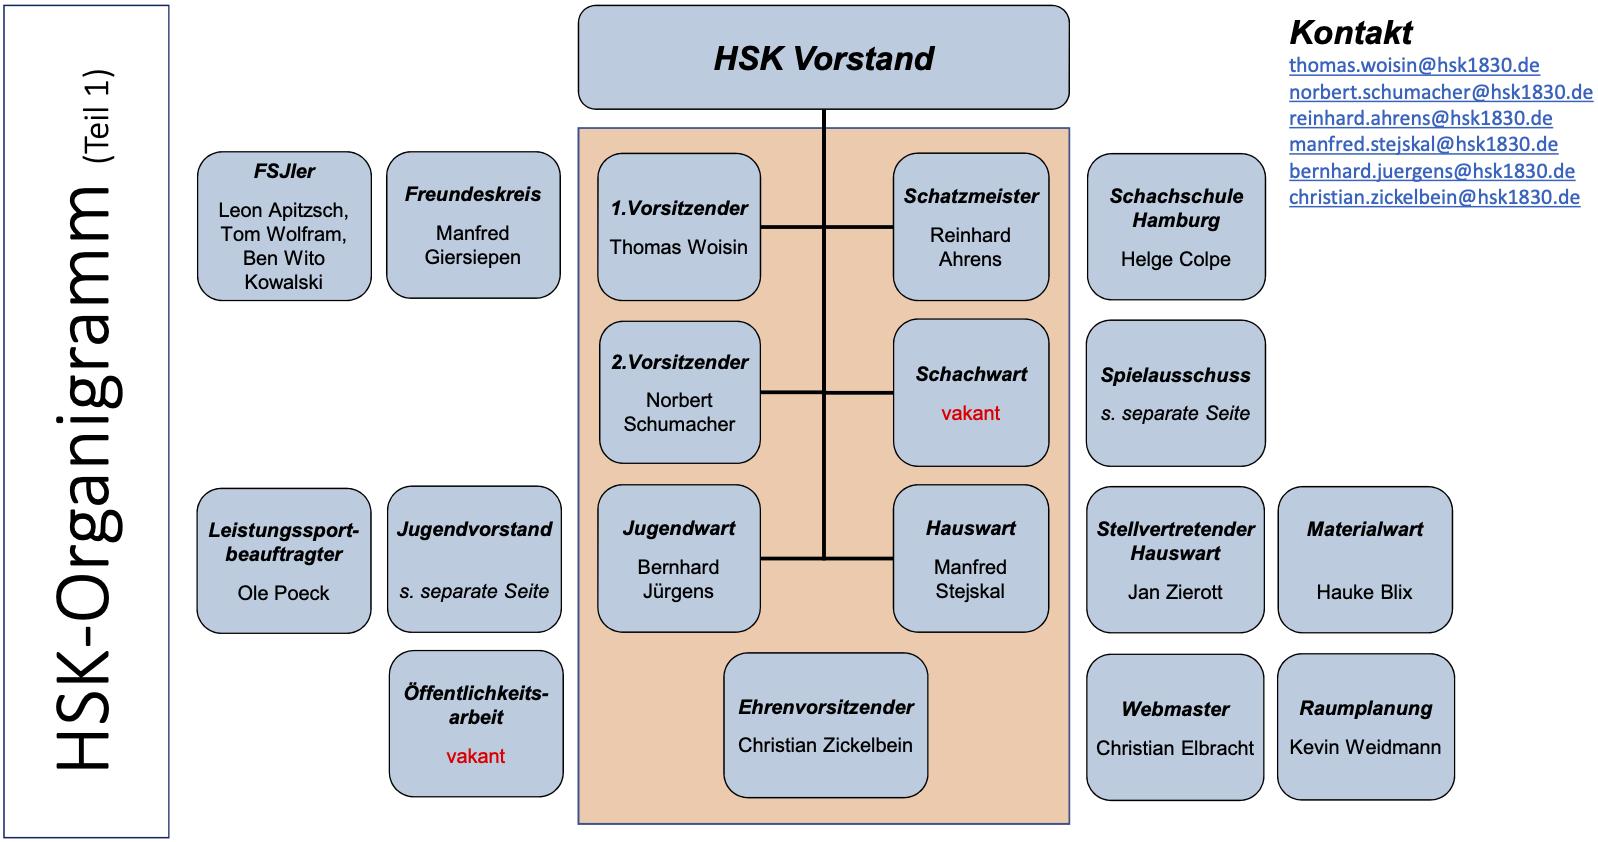 HSK Vorstand